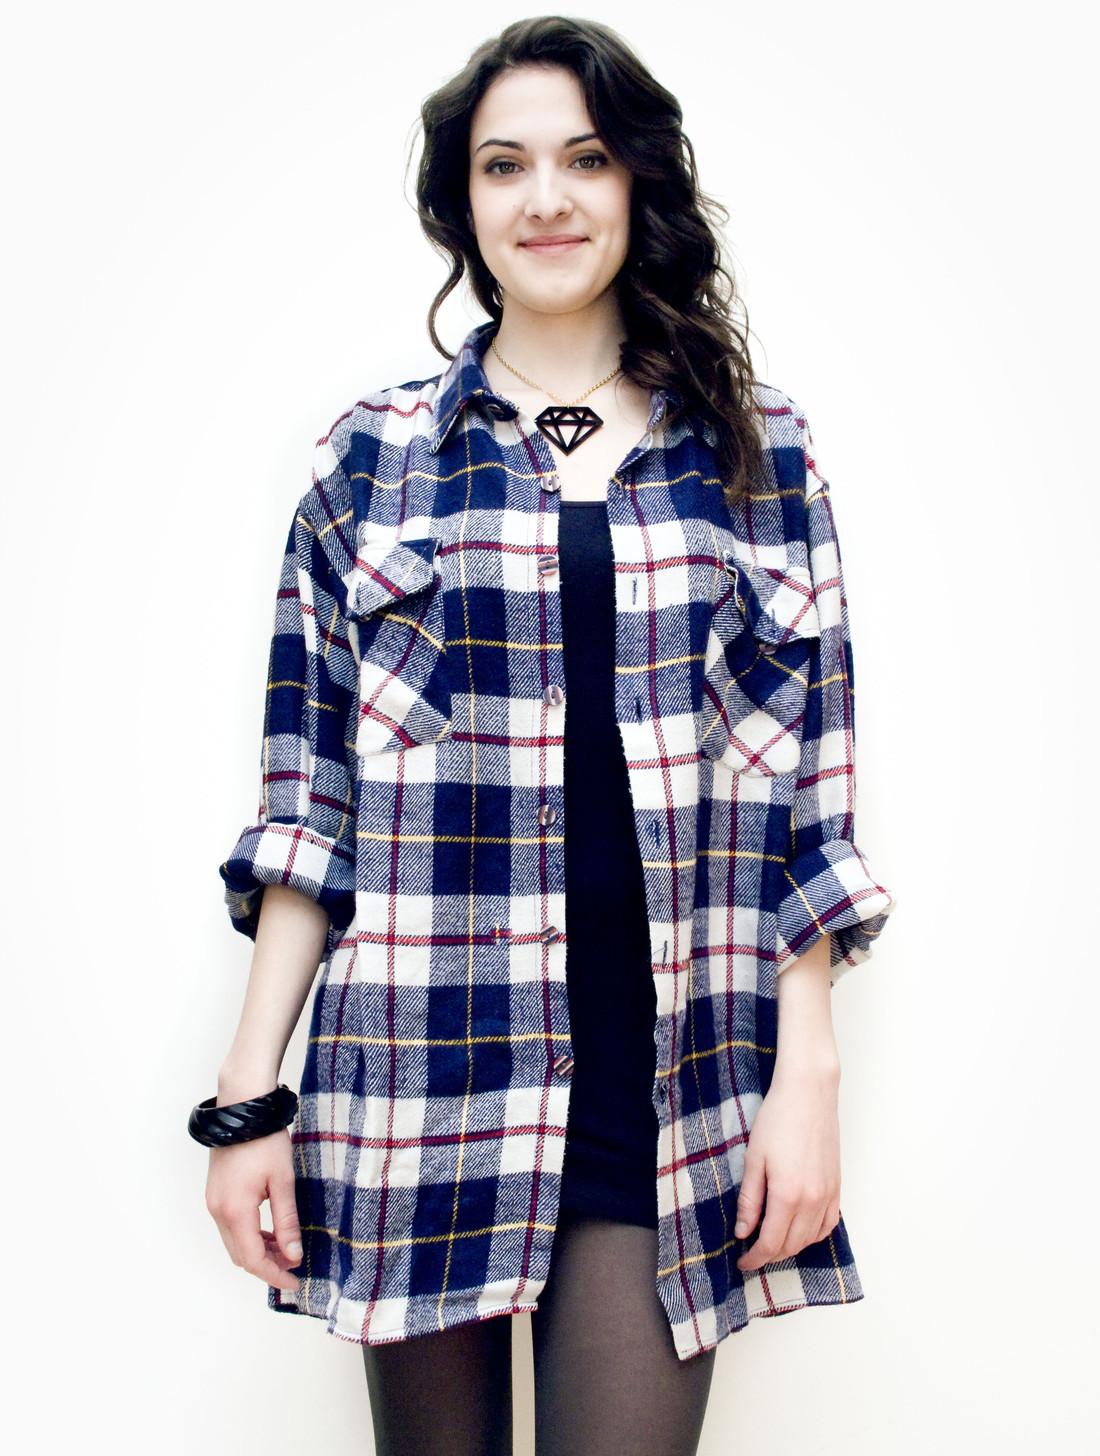 Oversized flannel shirt - Pop Sick Vintage